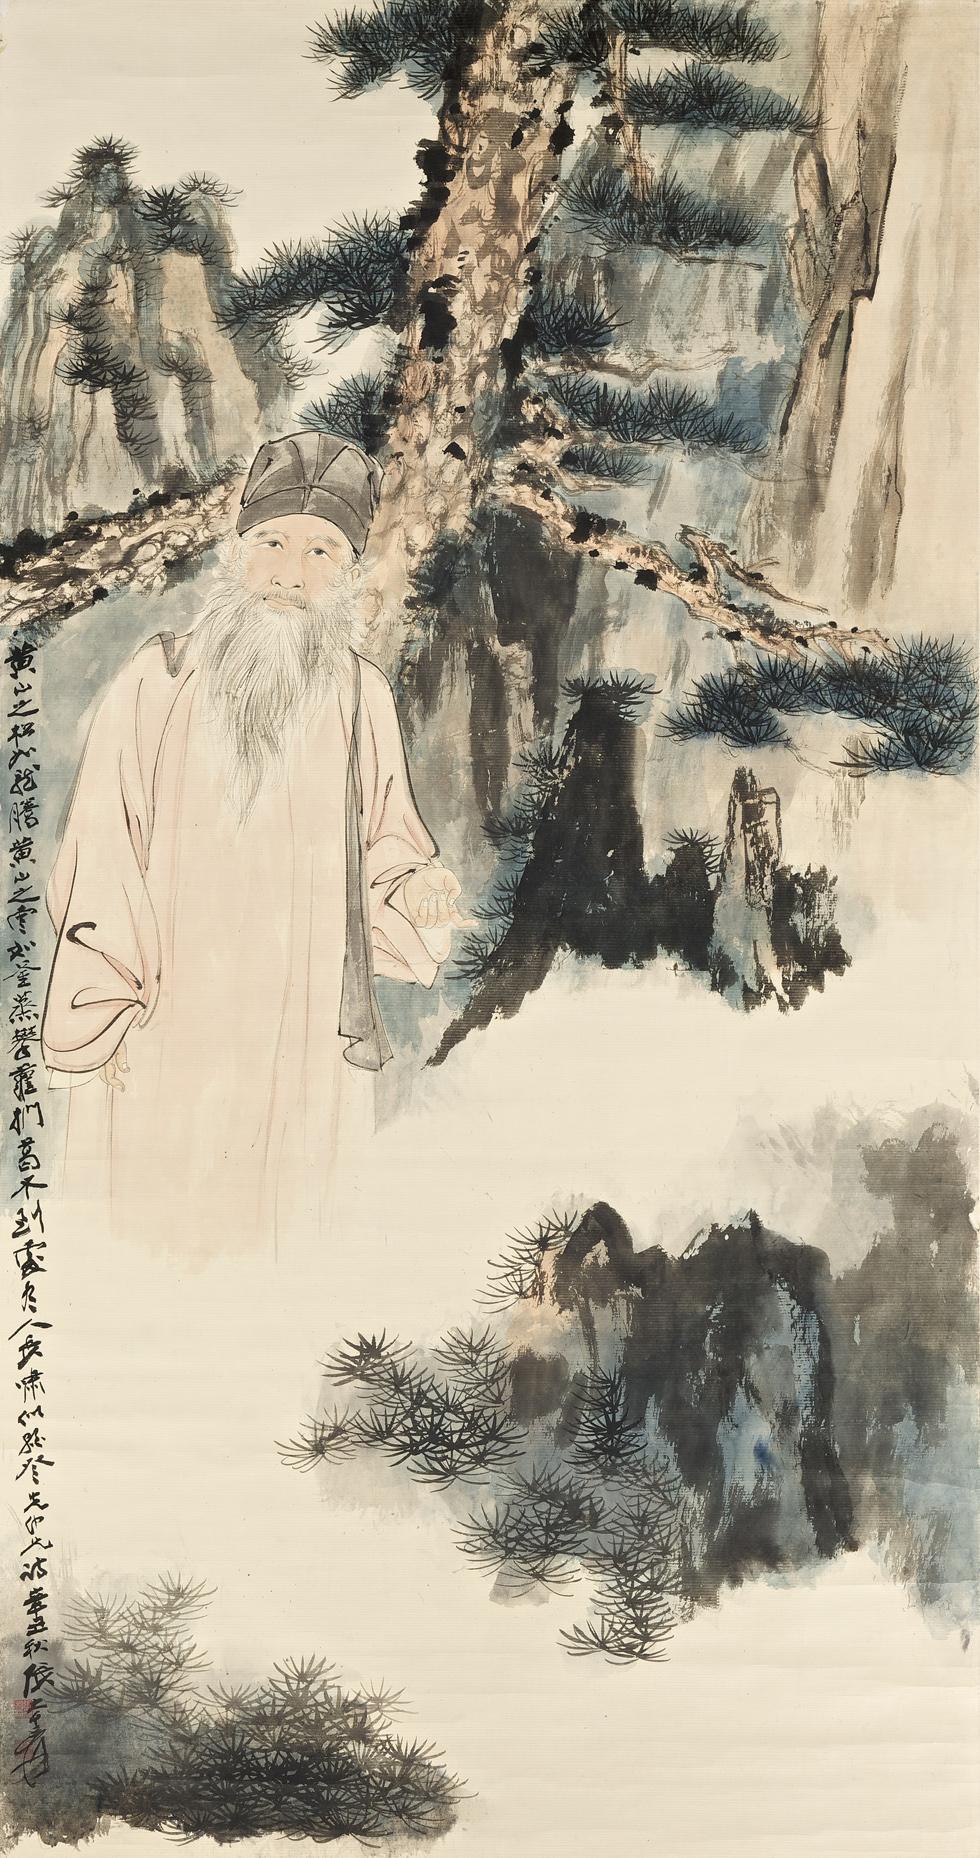 Zhang Daqian The World S Top Selling Artist At Auction In 2011 171 Antiquesandartireland Com